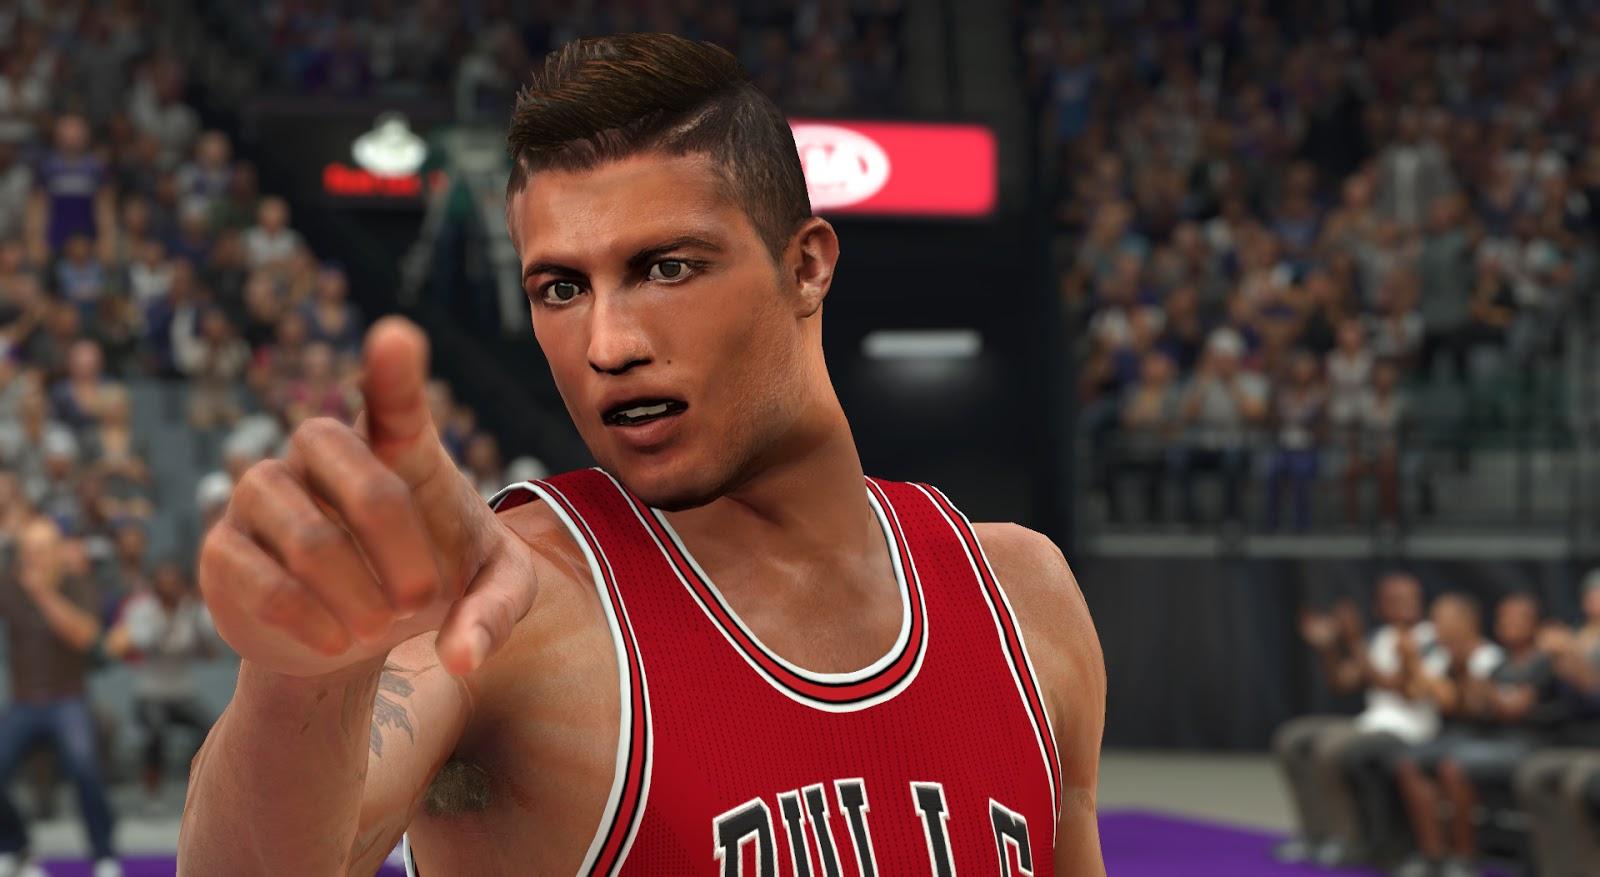 DNA Of Basketball   DNAOBB: NBA 2K17 Cristiano Ronaldo Cyberface by Stonecoldvs